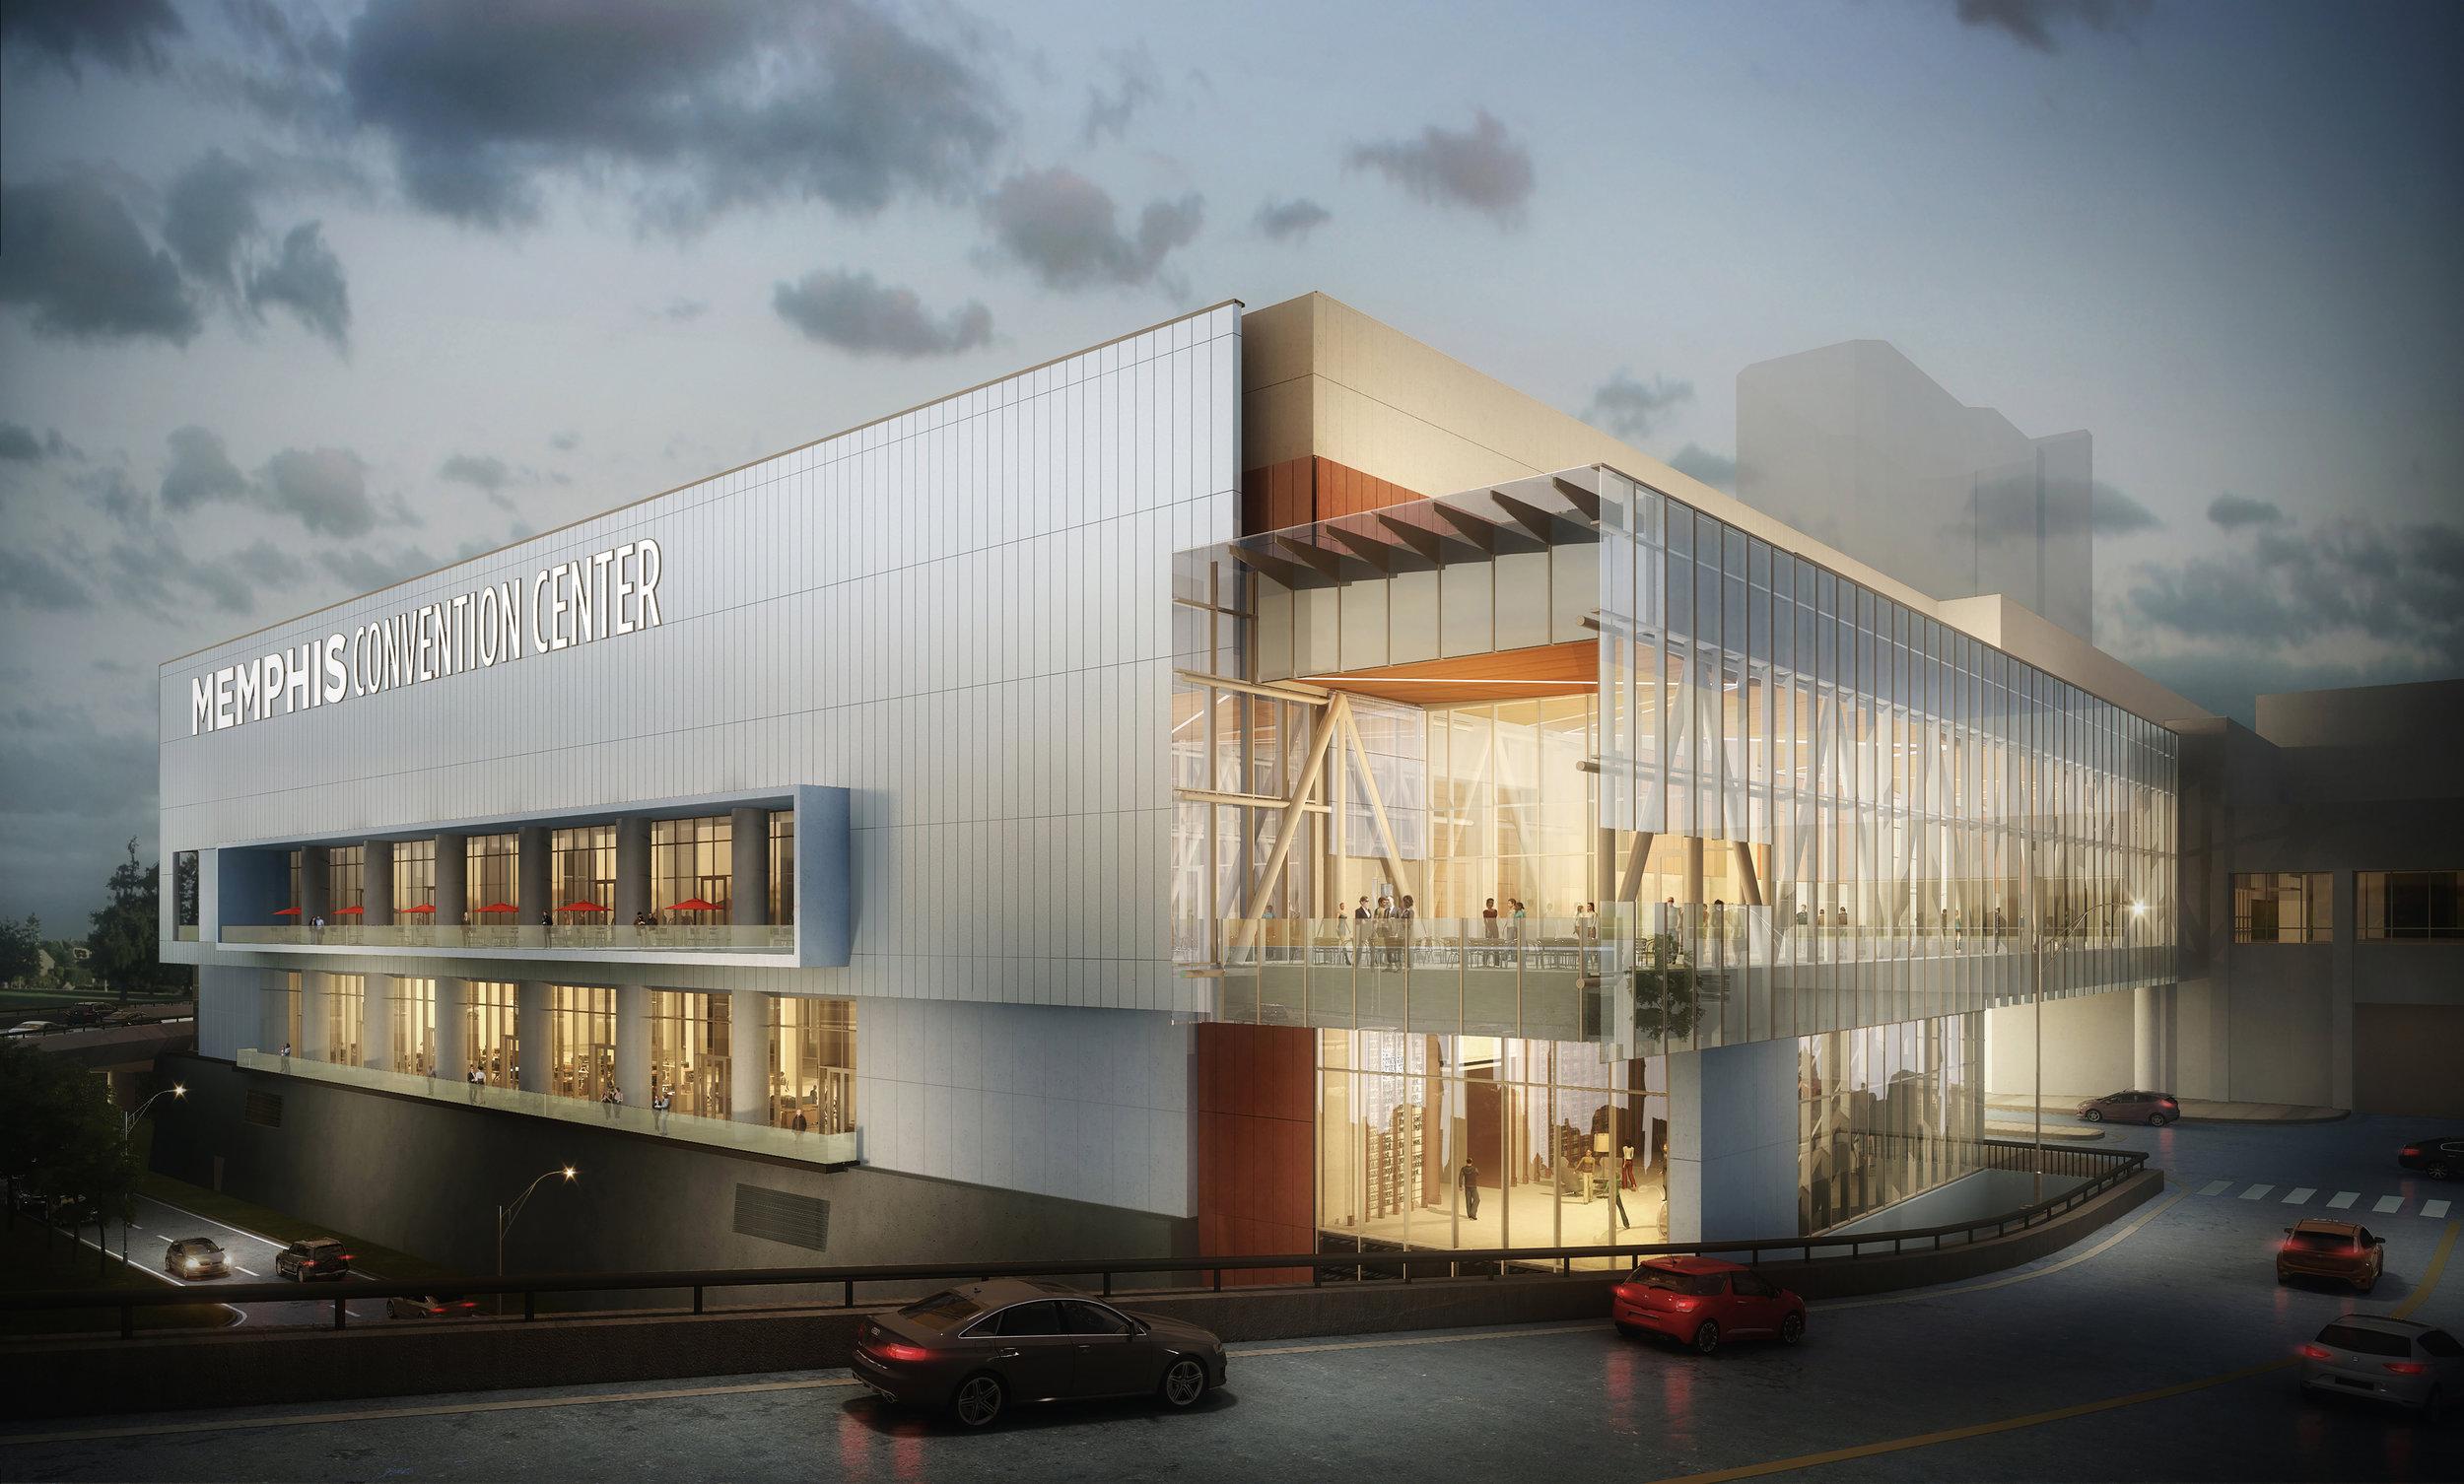 Renovated Memphis Convention Center, LRK